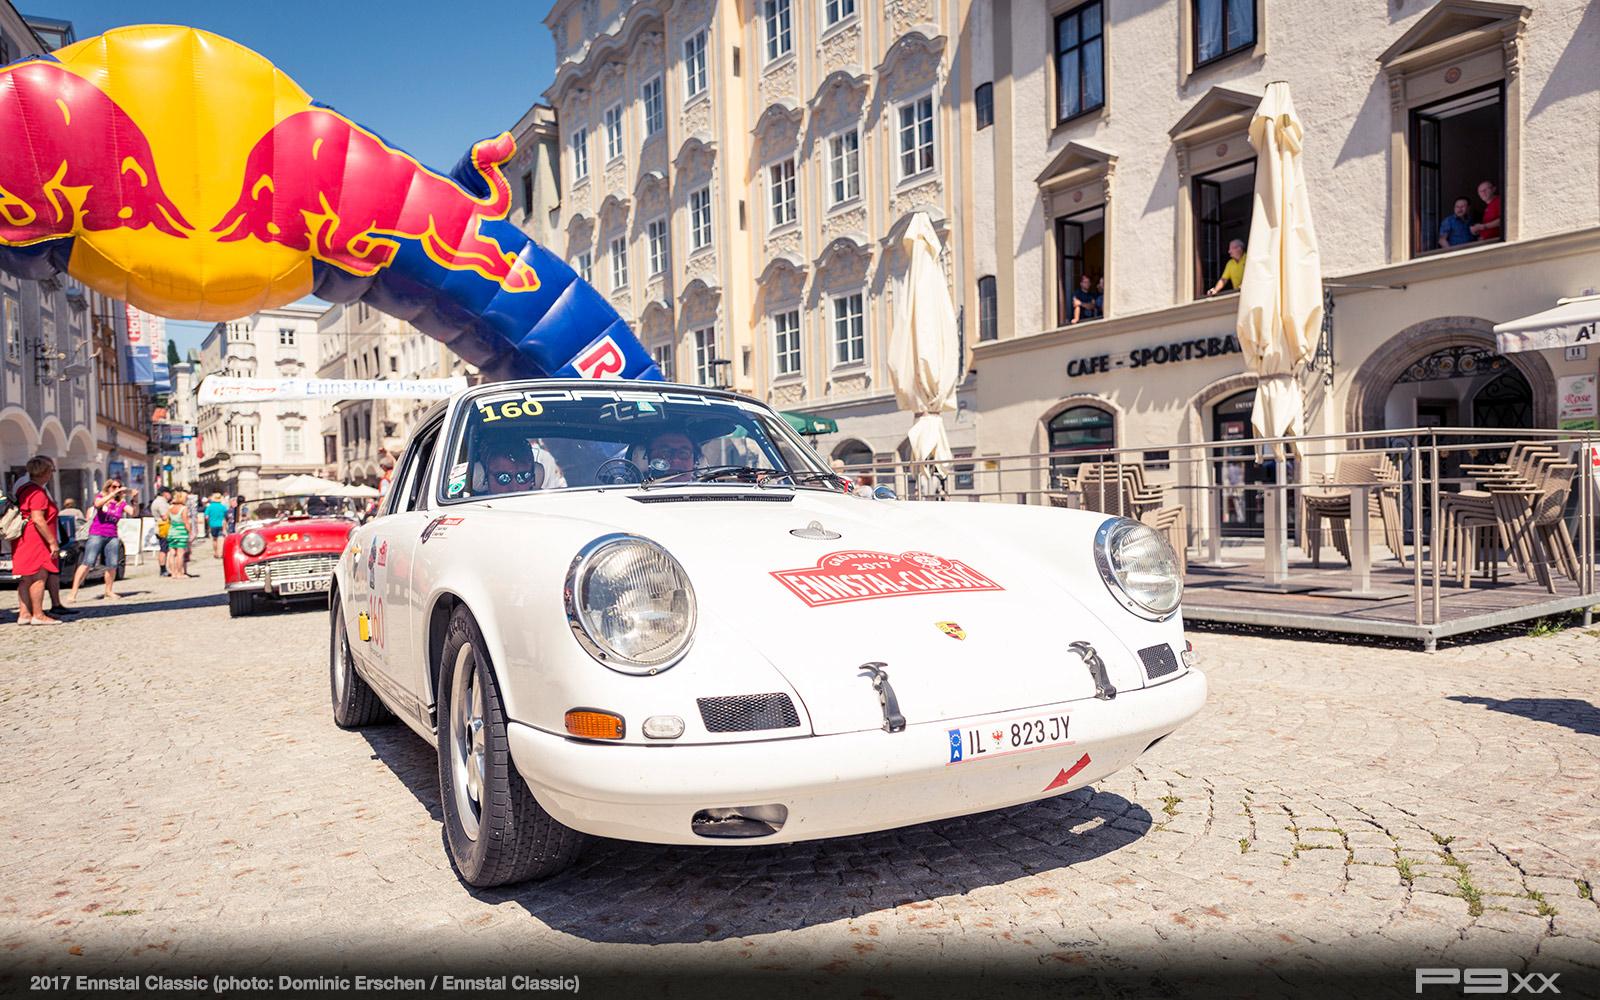 2017 Ennstal Classic Rally